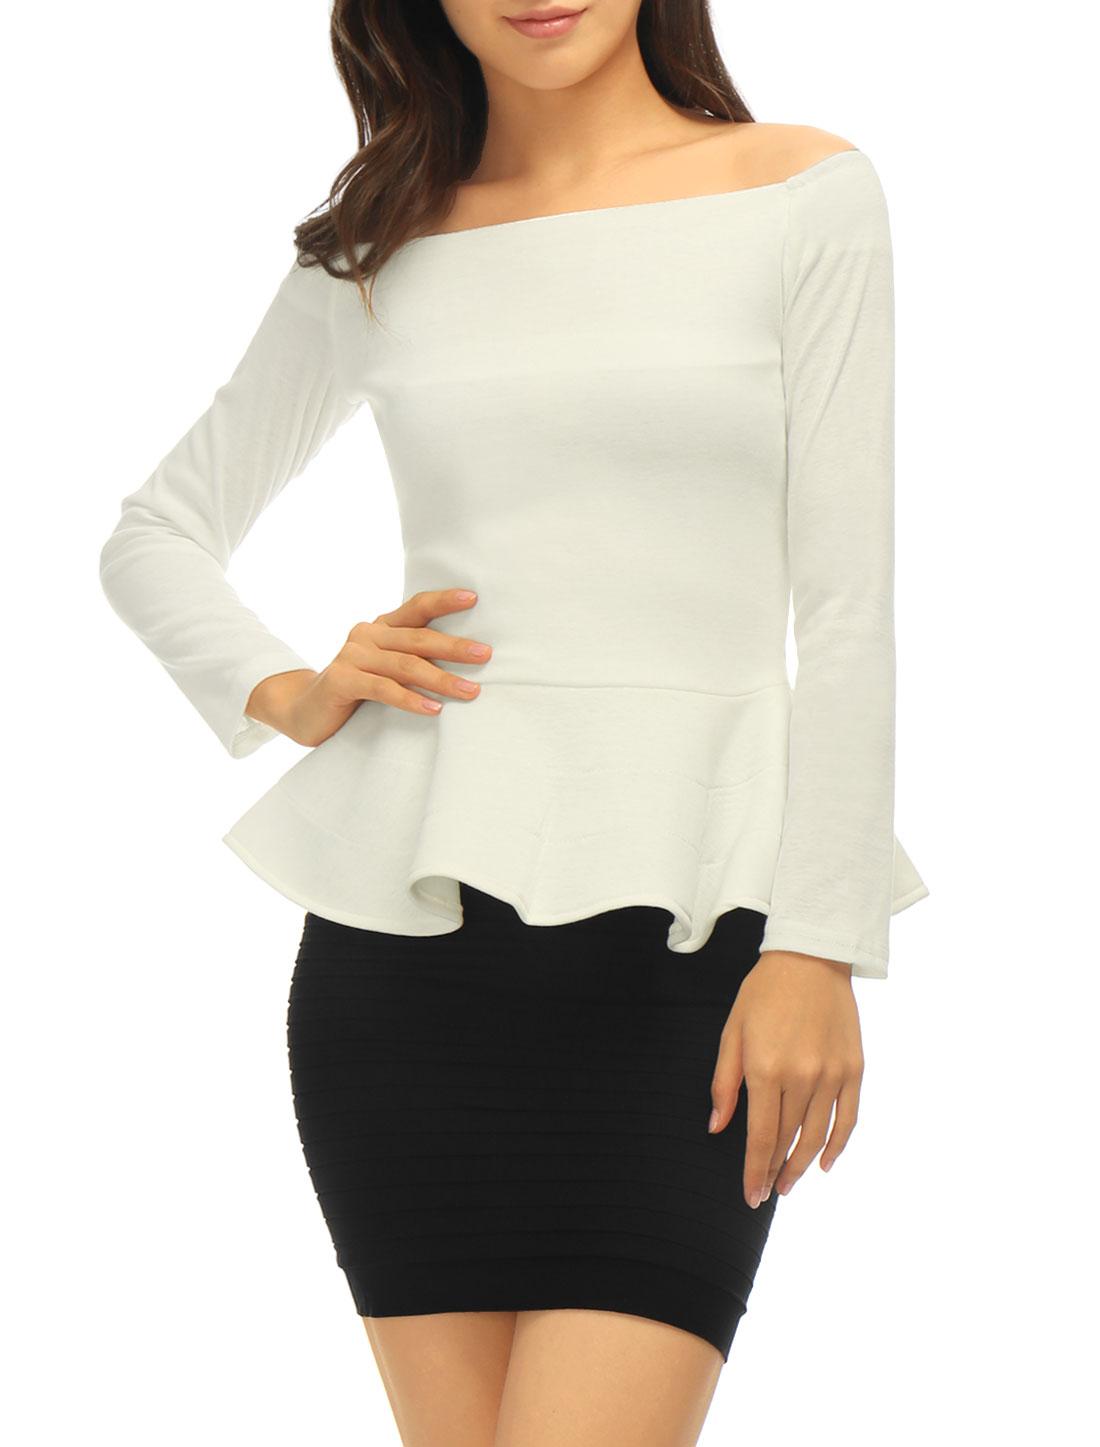 Women Off Shoulder Long Sleeves Slim Fit Peplum Top White S